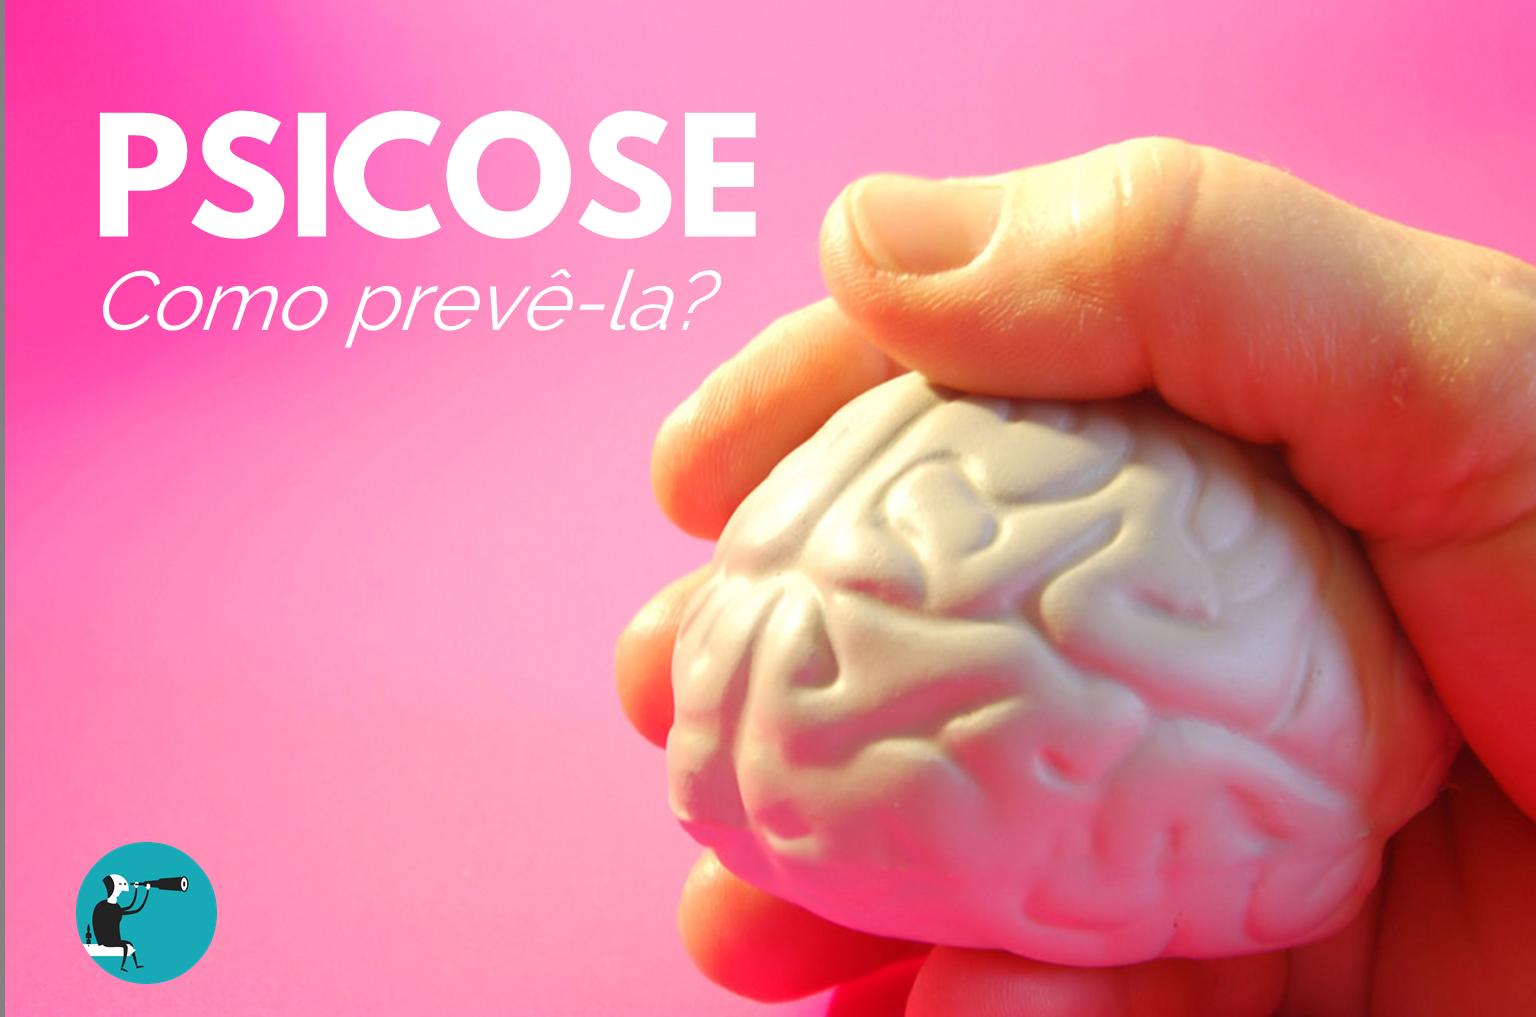 Quem irá desenvolver psicose? Programa que analisa a fala pode prever o risco